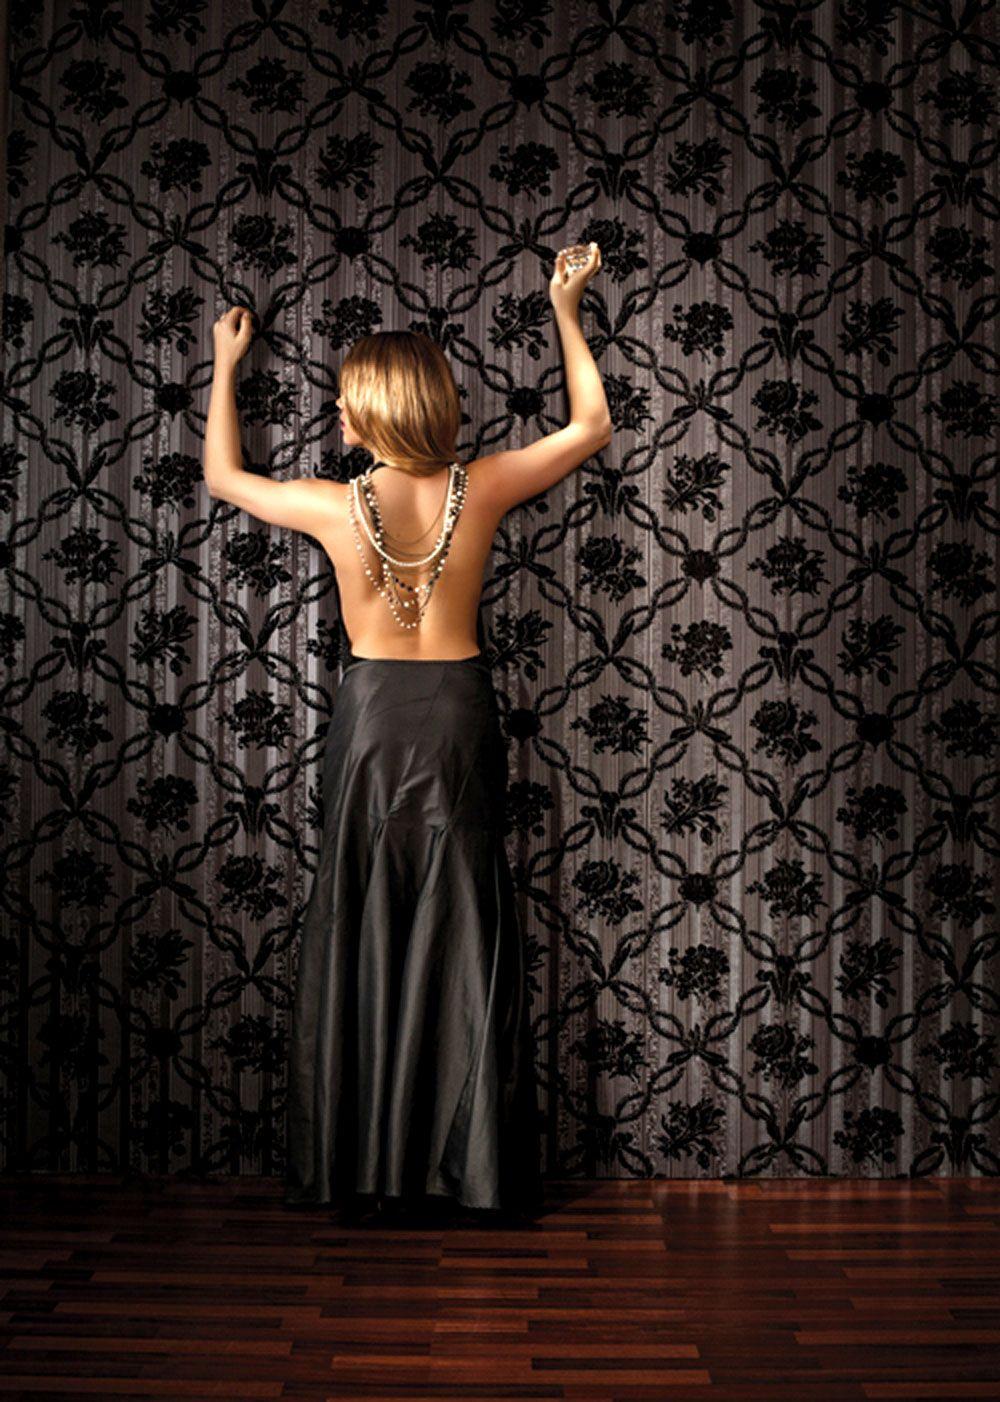 luxustapete stil wall silk iv muster schwarz barock tapete. Black Bedroom Furniture Sets. Home Design Ideas